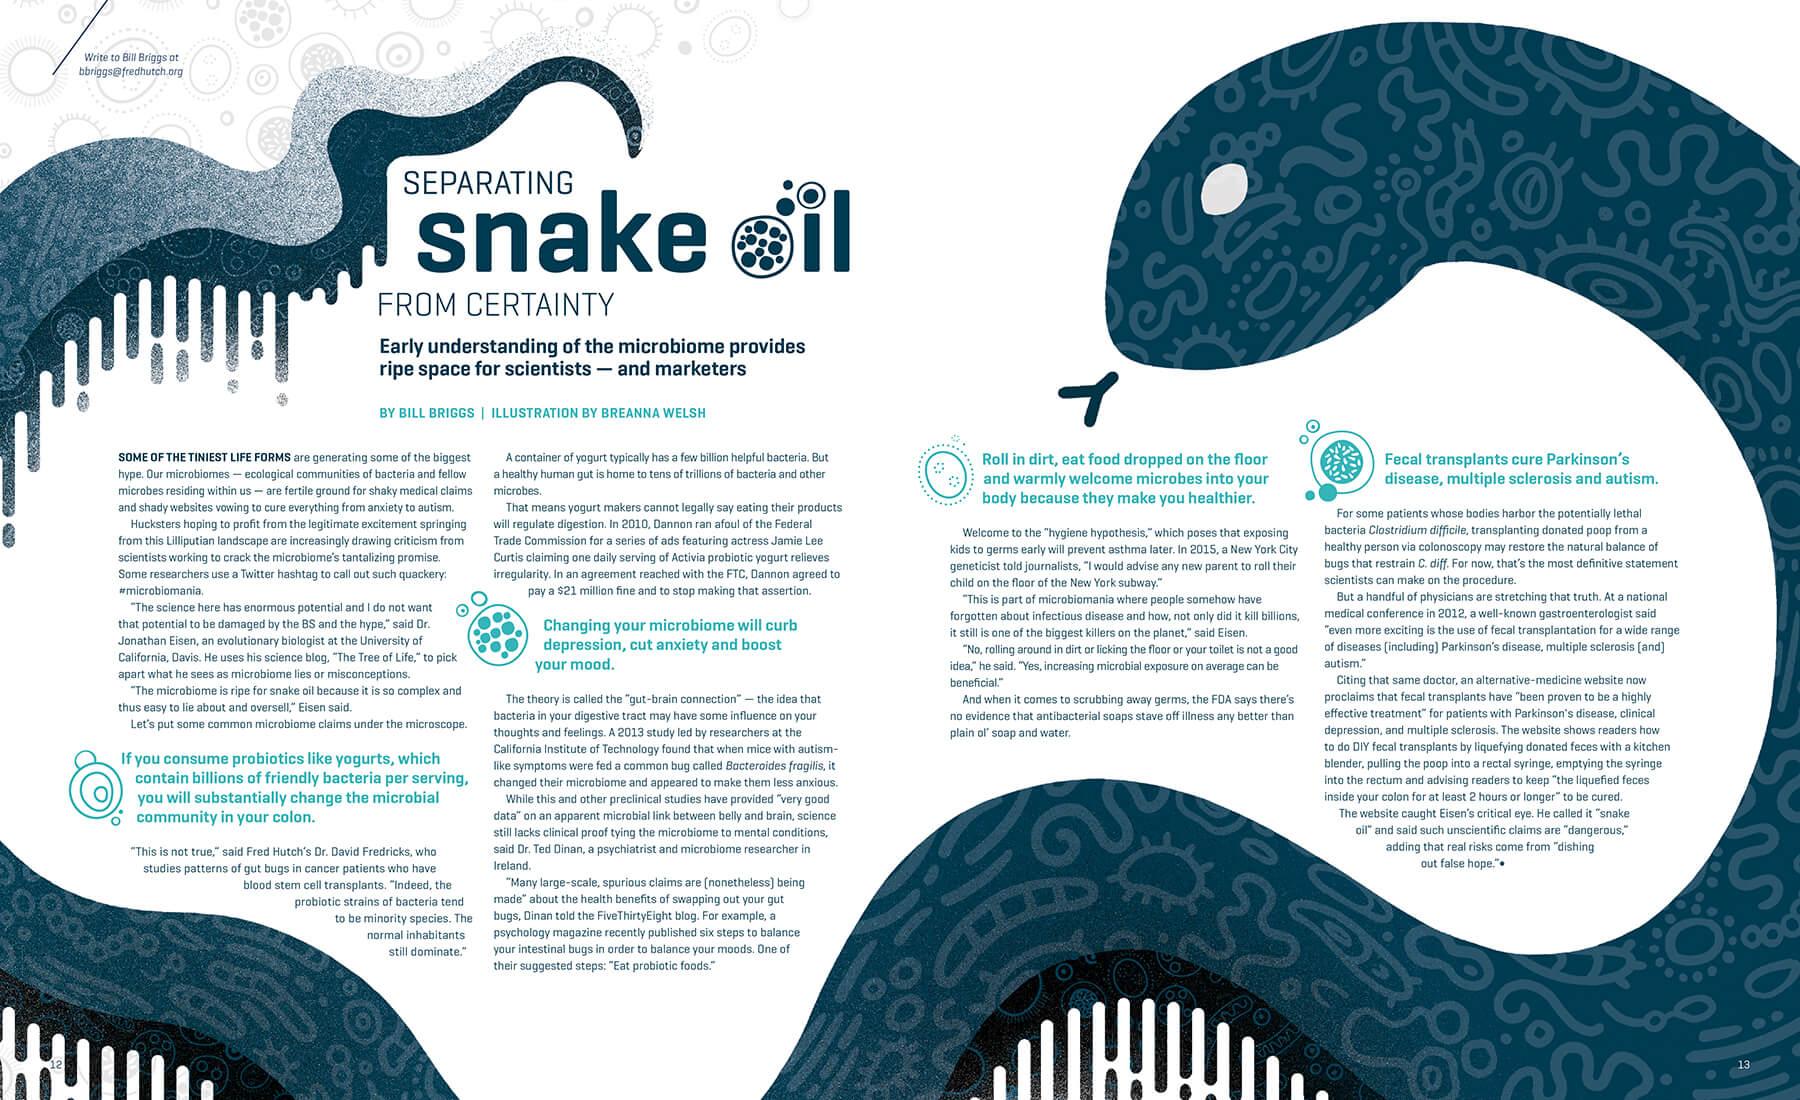 Illustration & spread design